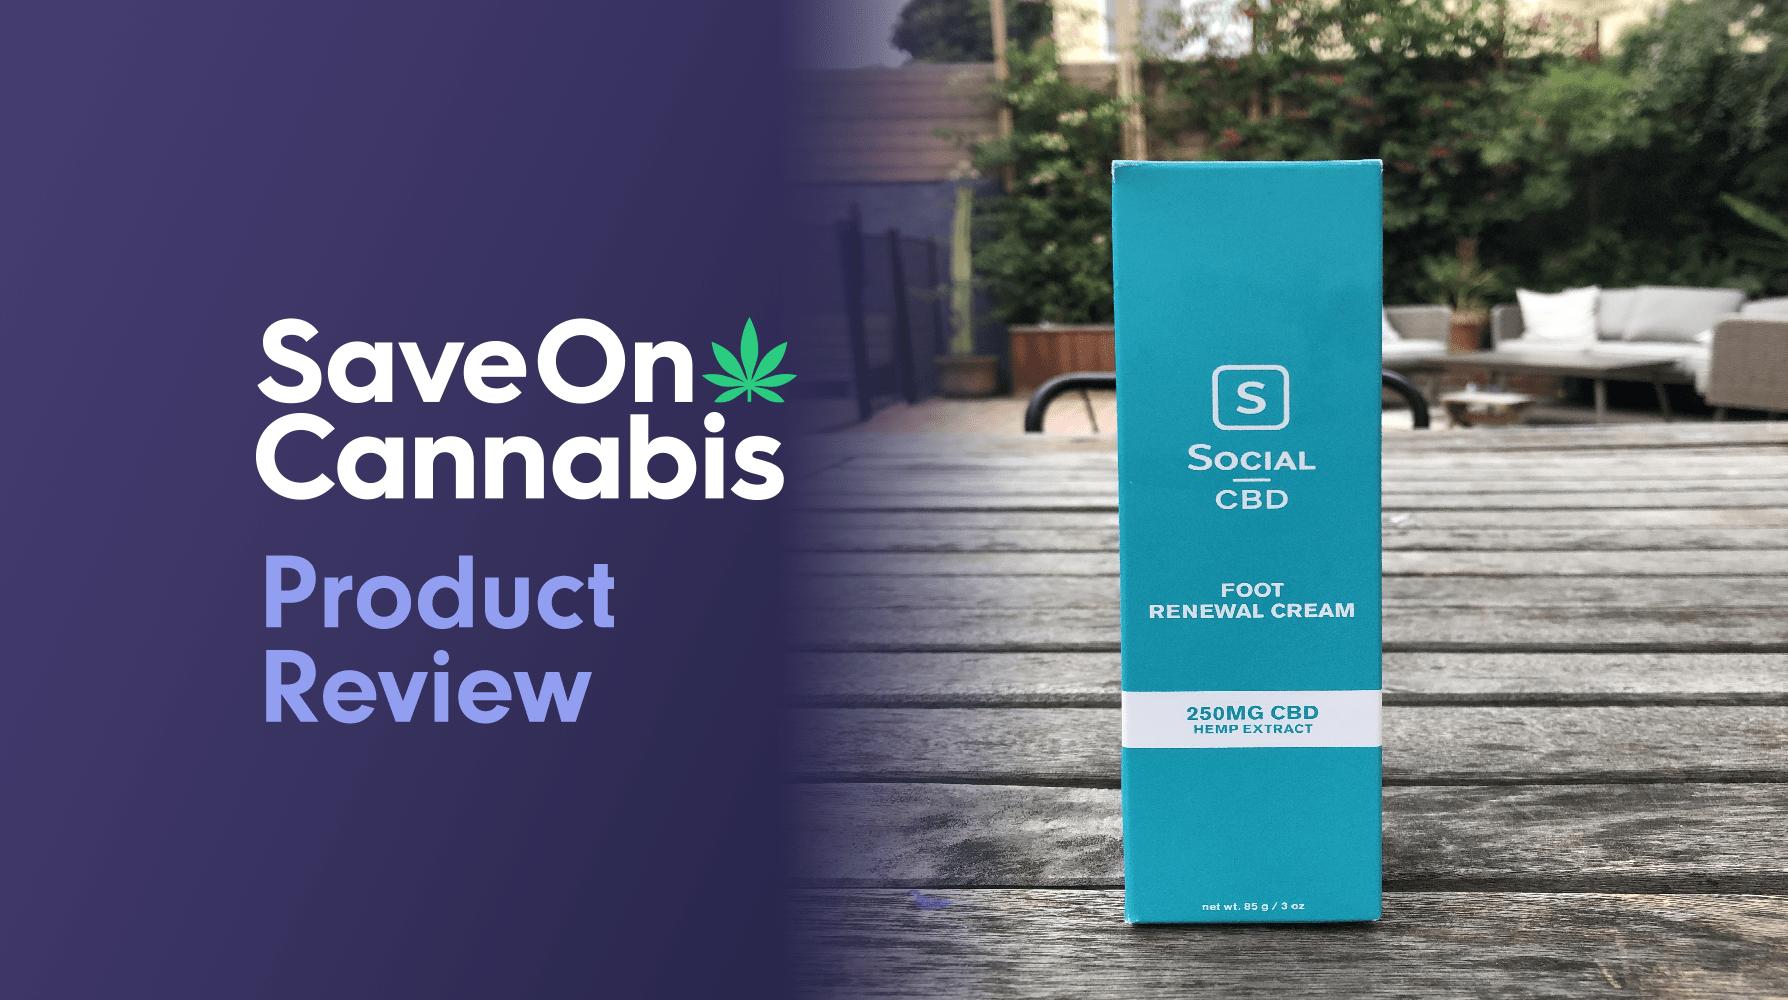 social cbd foot renewal cream save on cannabis website